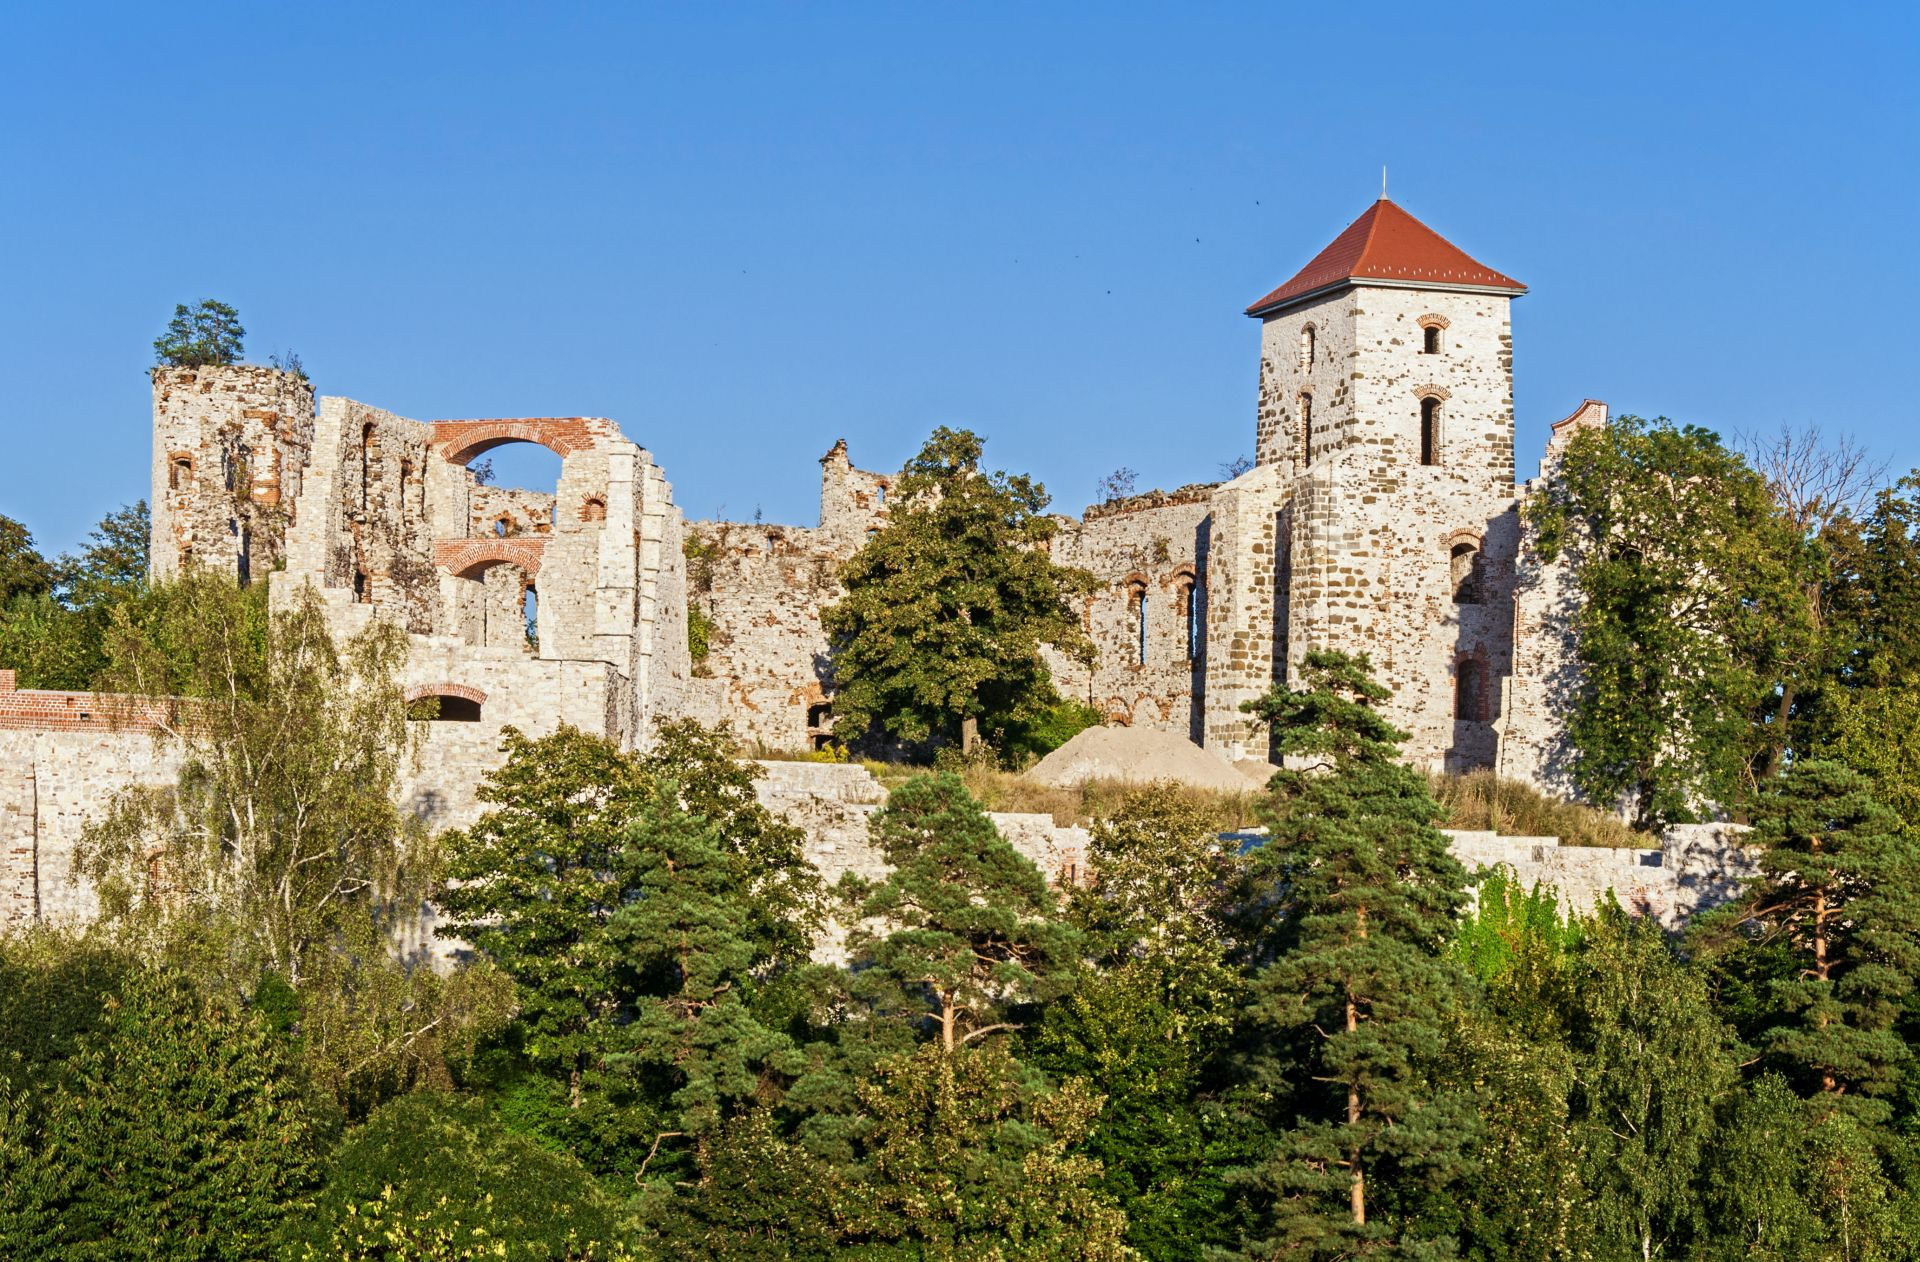 Castle ruins in Tenczynek, Poland